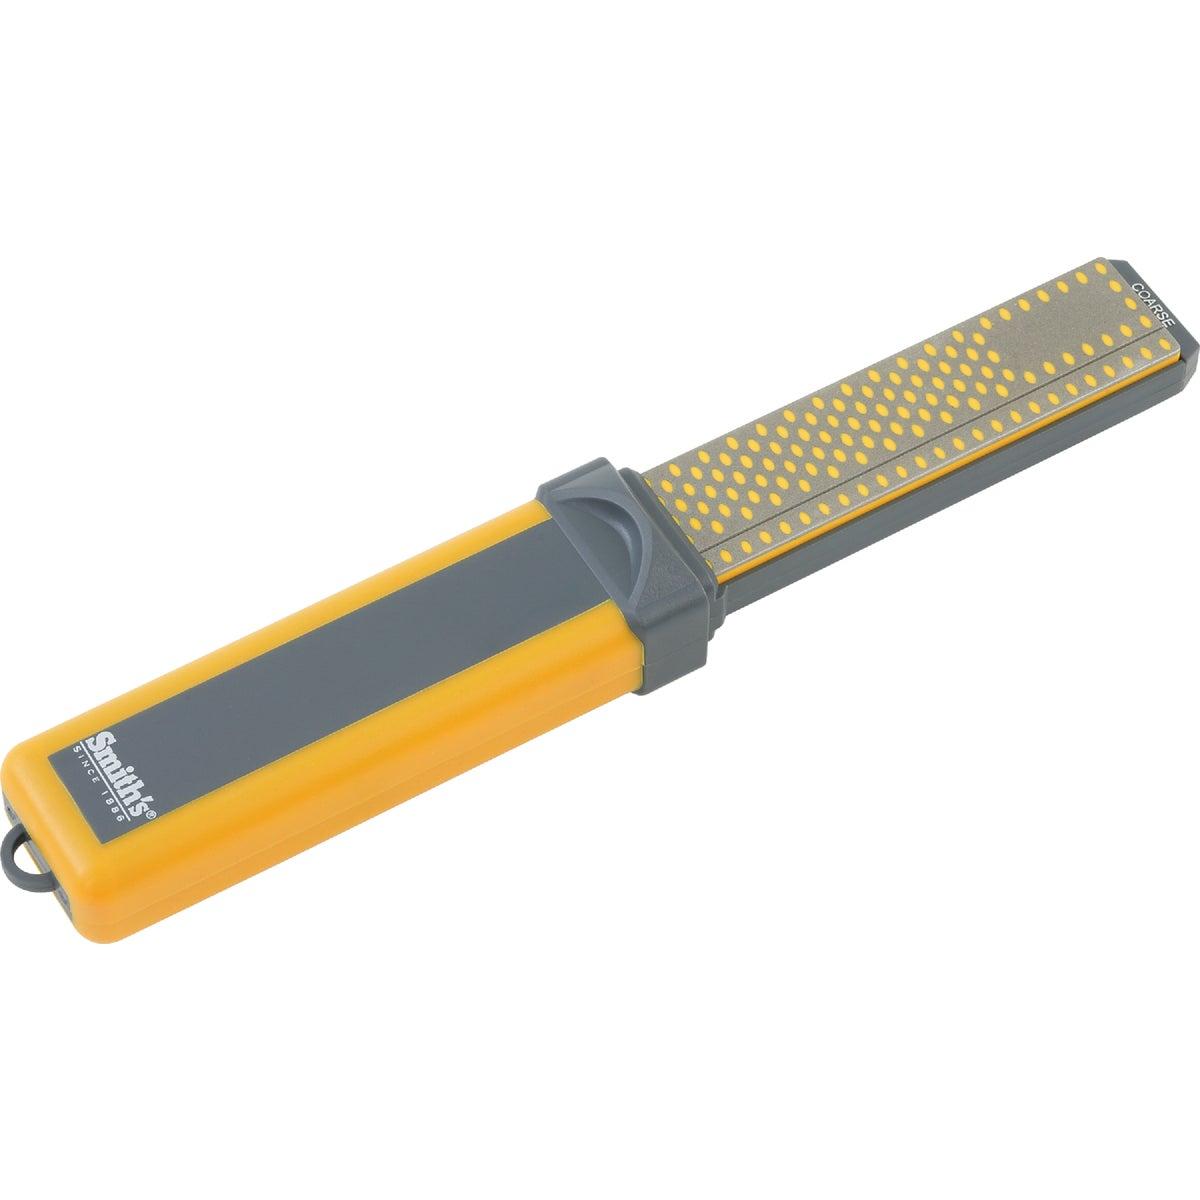 Smith Abrasives, Inc. COMBO SHARPENER DCS4